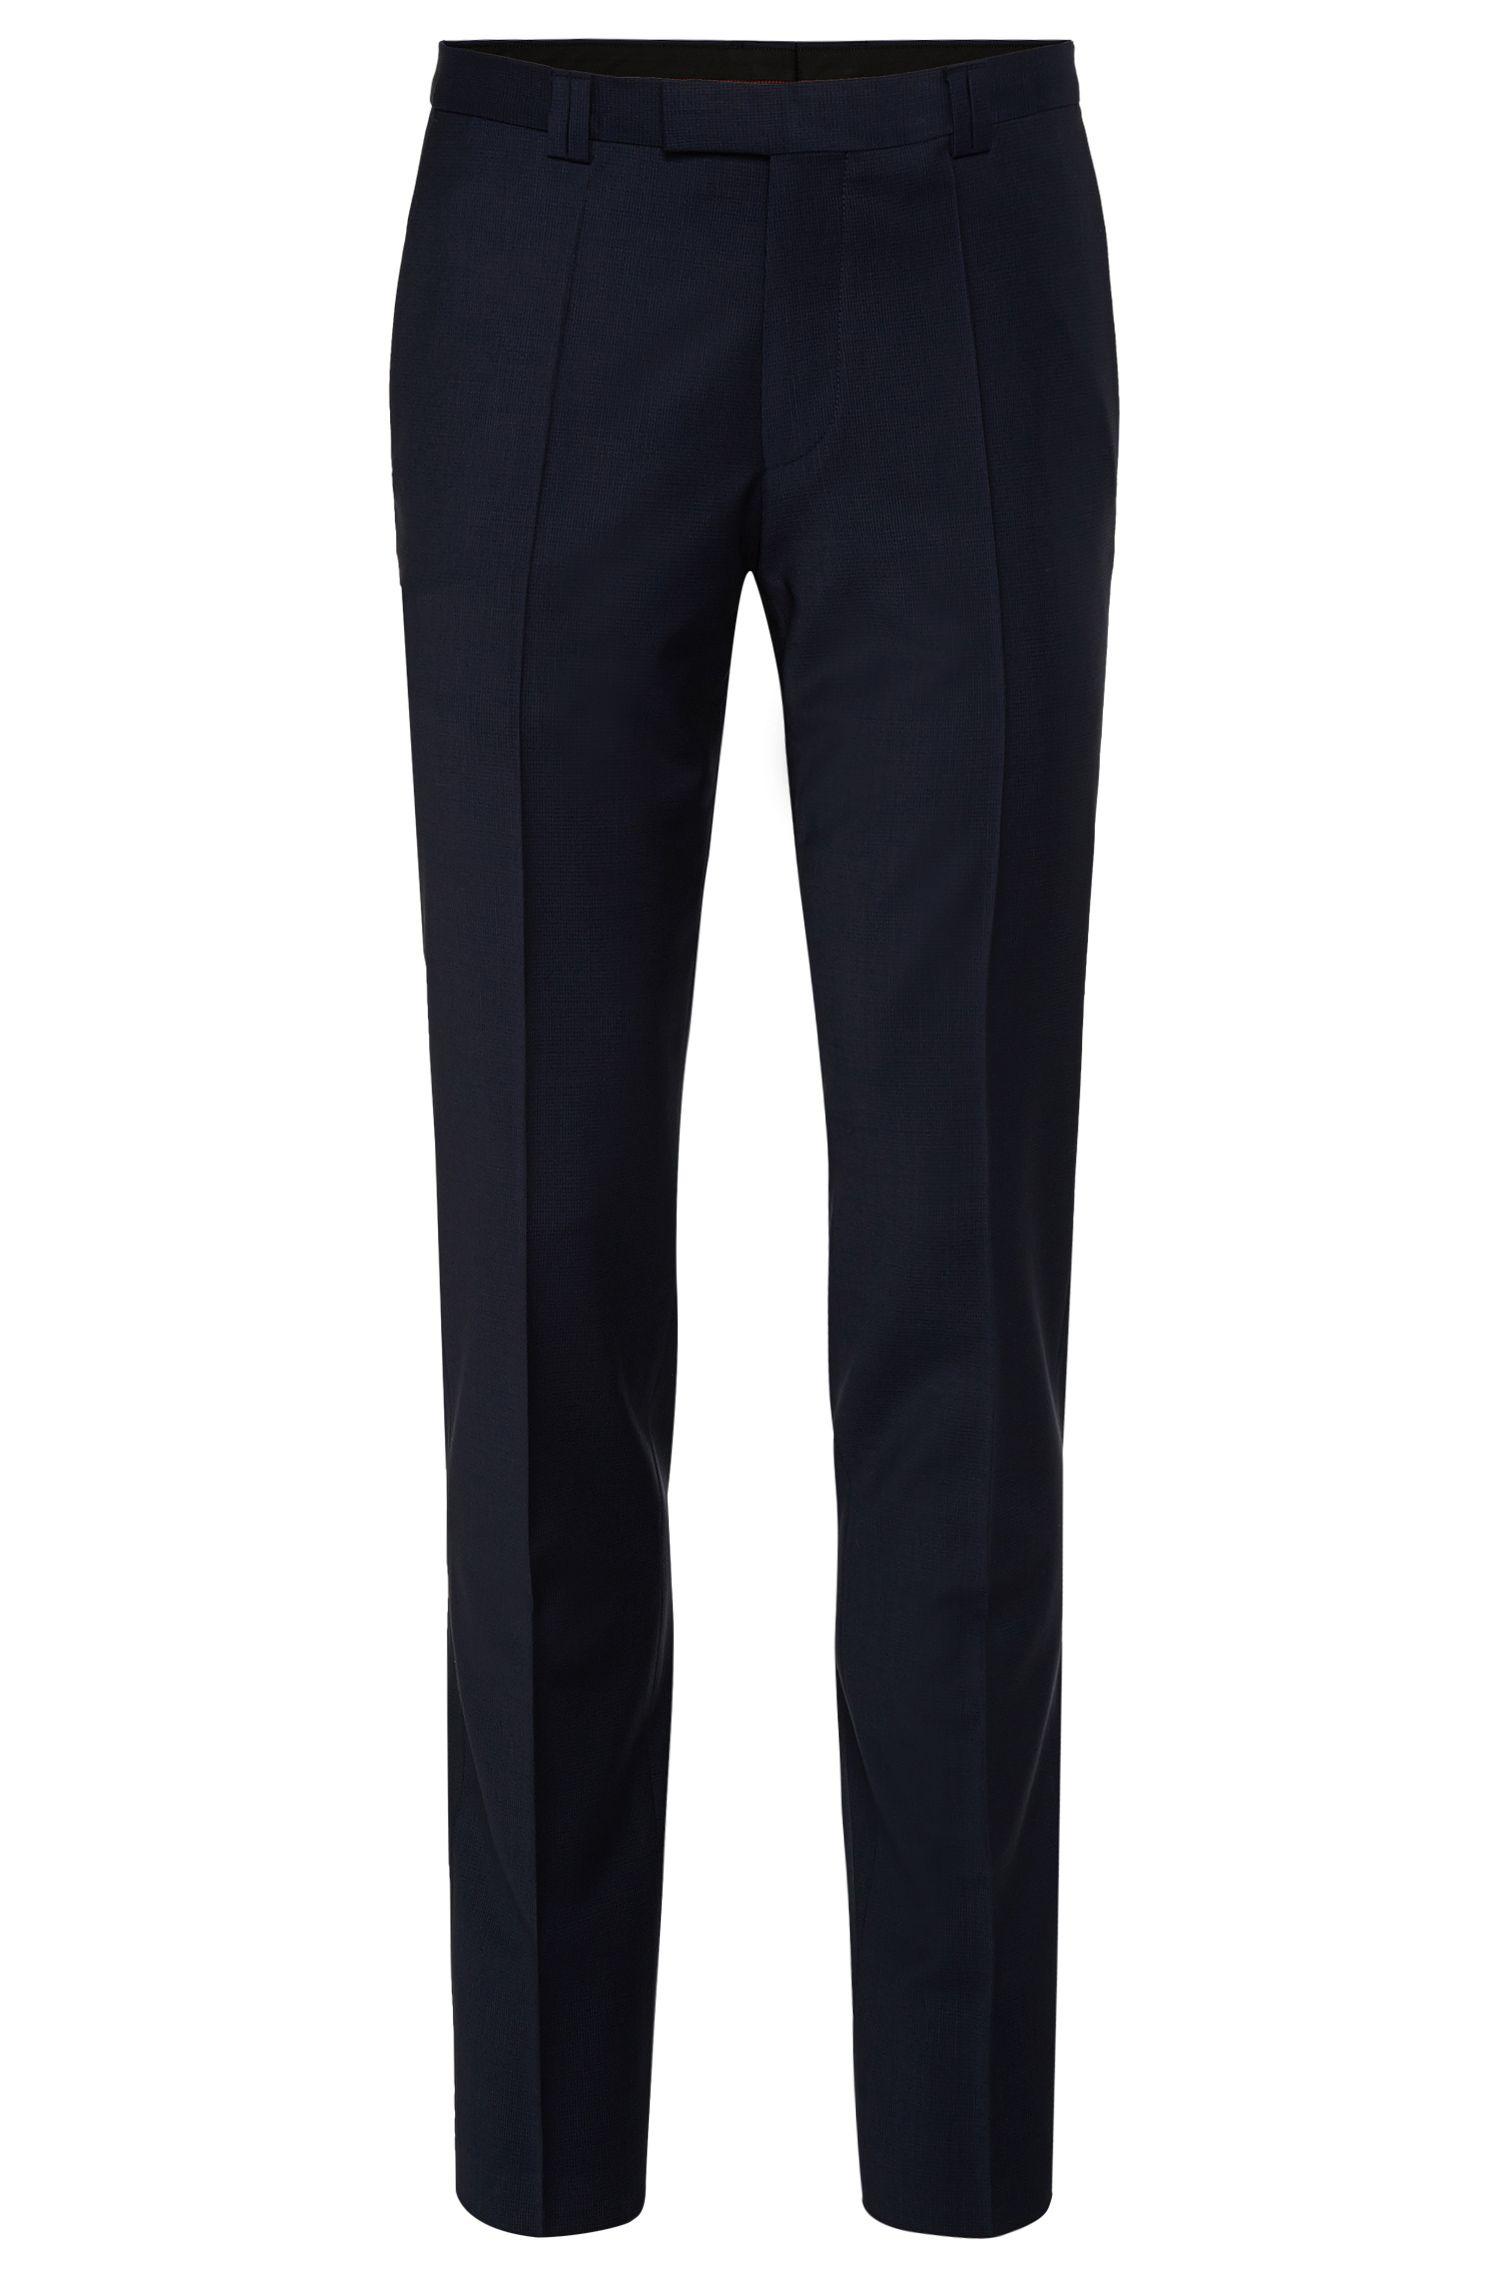 'Heibo'   Extra Slim Fit, Stretch Virgin Wool Blend Dress Pants